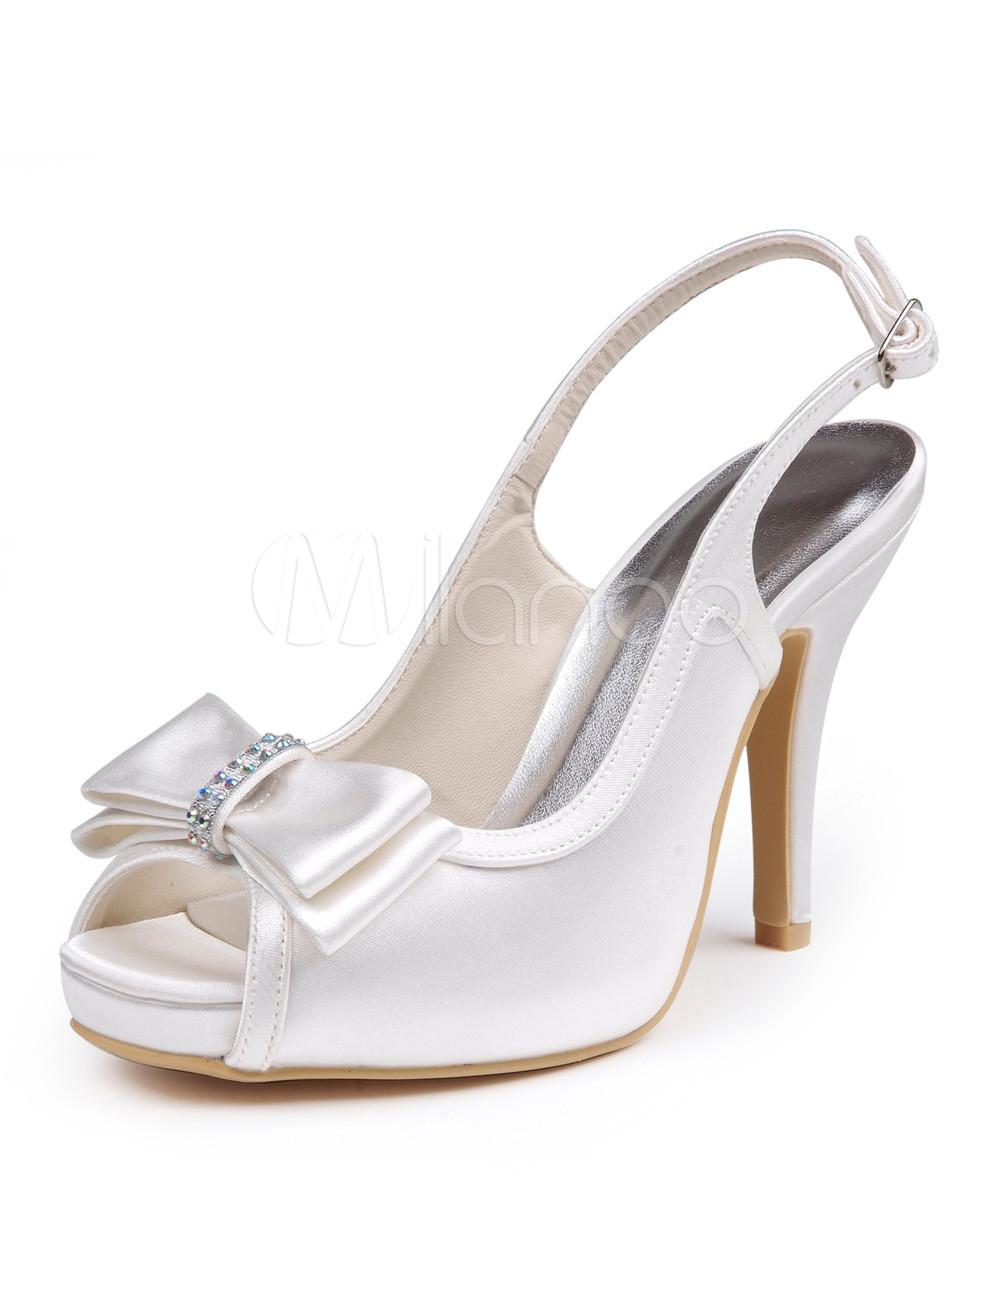 White Bow Peep Toe Silk And Satin Slingback Bridal Shoes